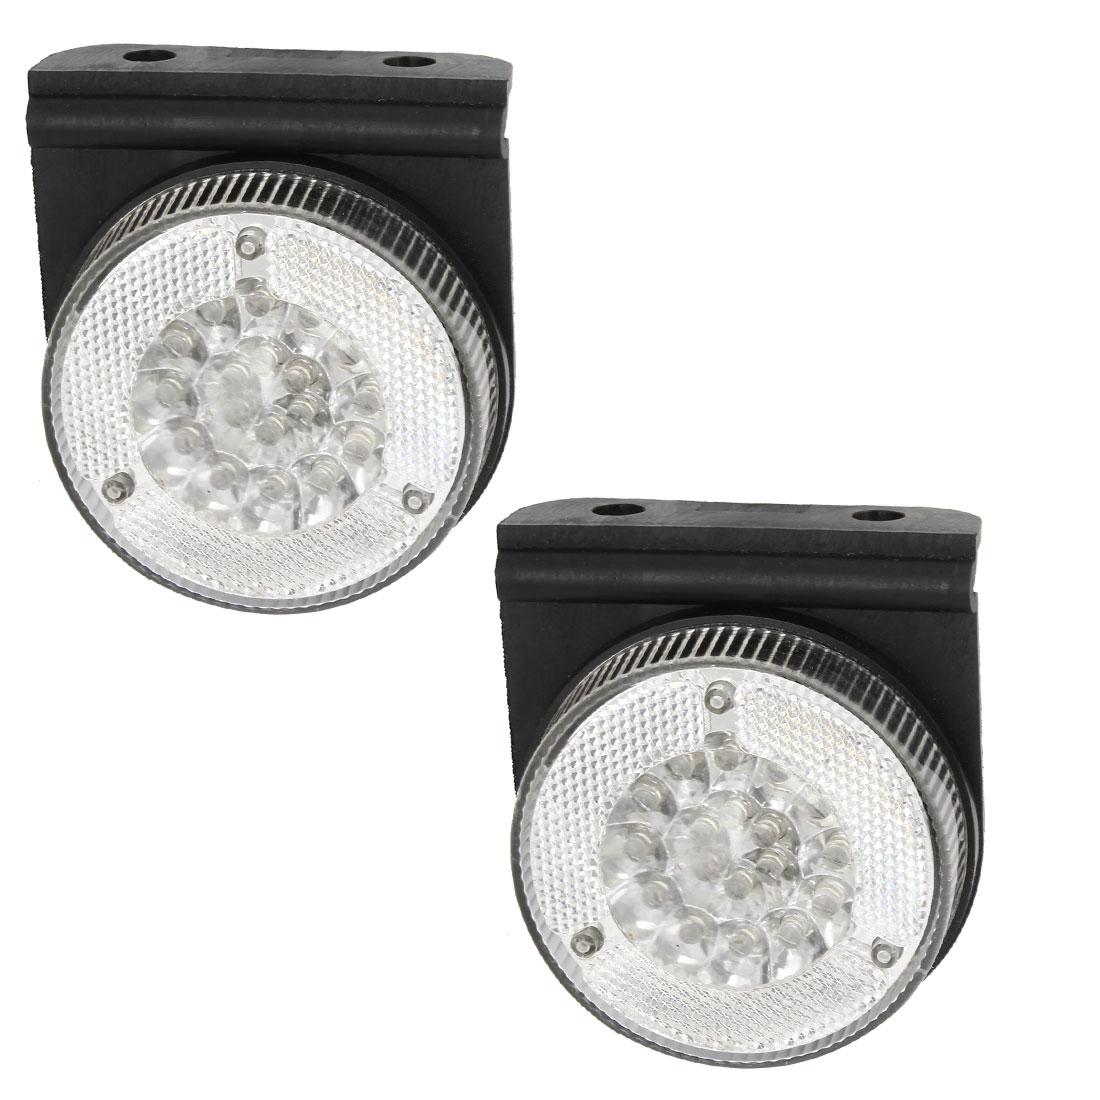 2 Pcs Round Shape White 18 LED Lamp Auto Signal Side Marker Light DC 24V